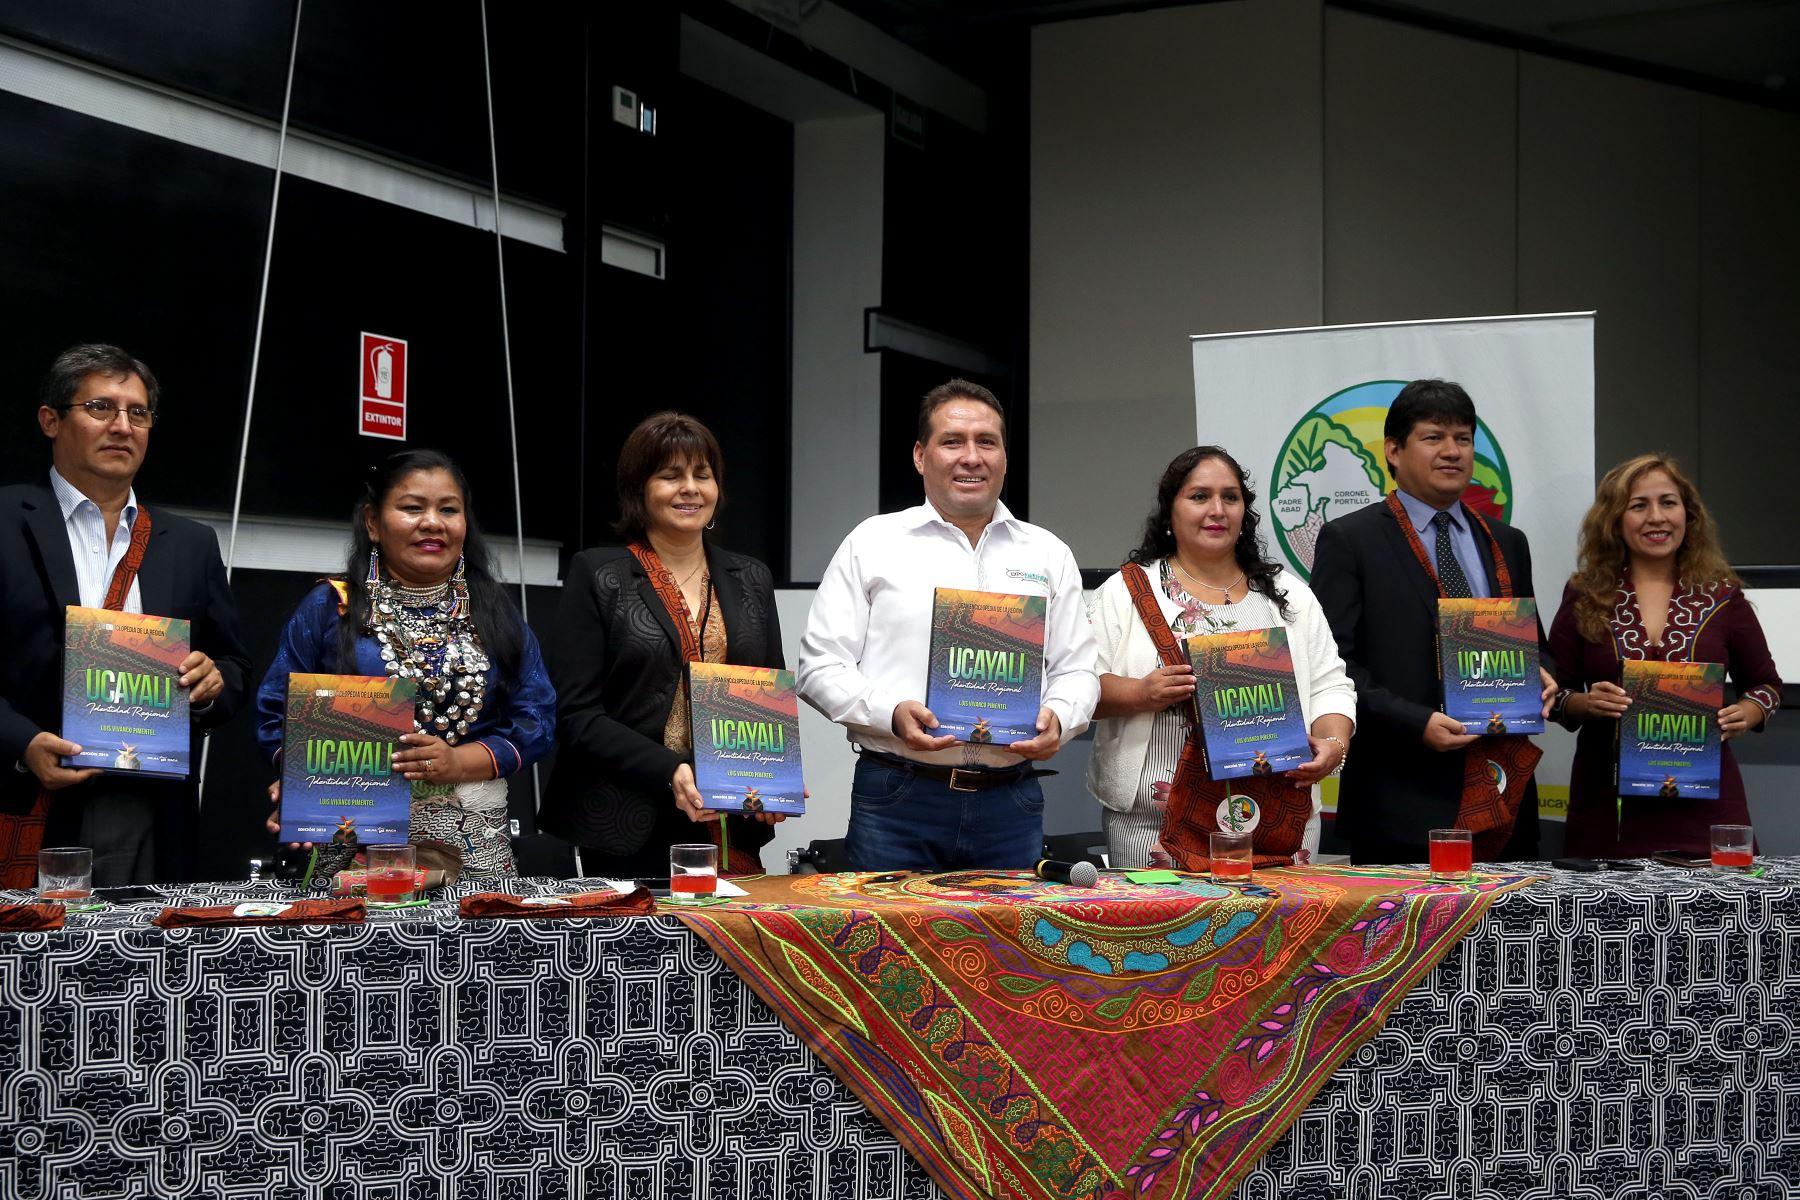 El gobernador regional de Ucayali Manuel Gambini Rupay, y autoridades municipales invitan al XXlll Festival de San Juan 2018. Foto: ANDINA/Dante Zegarra.